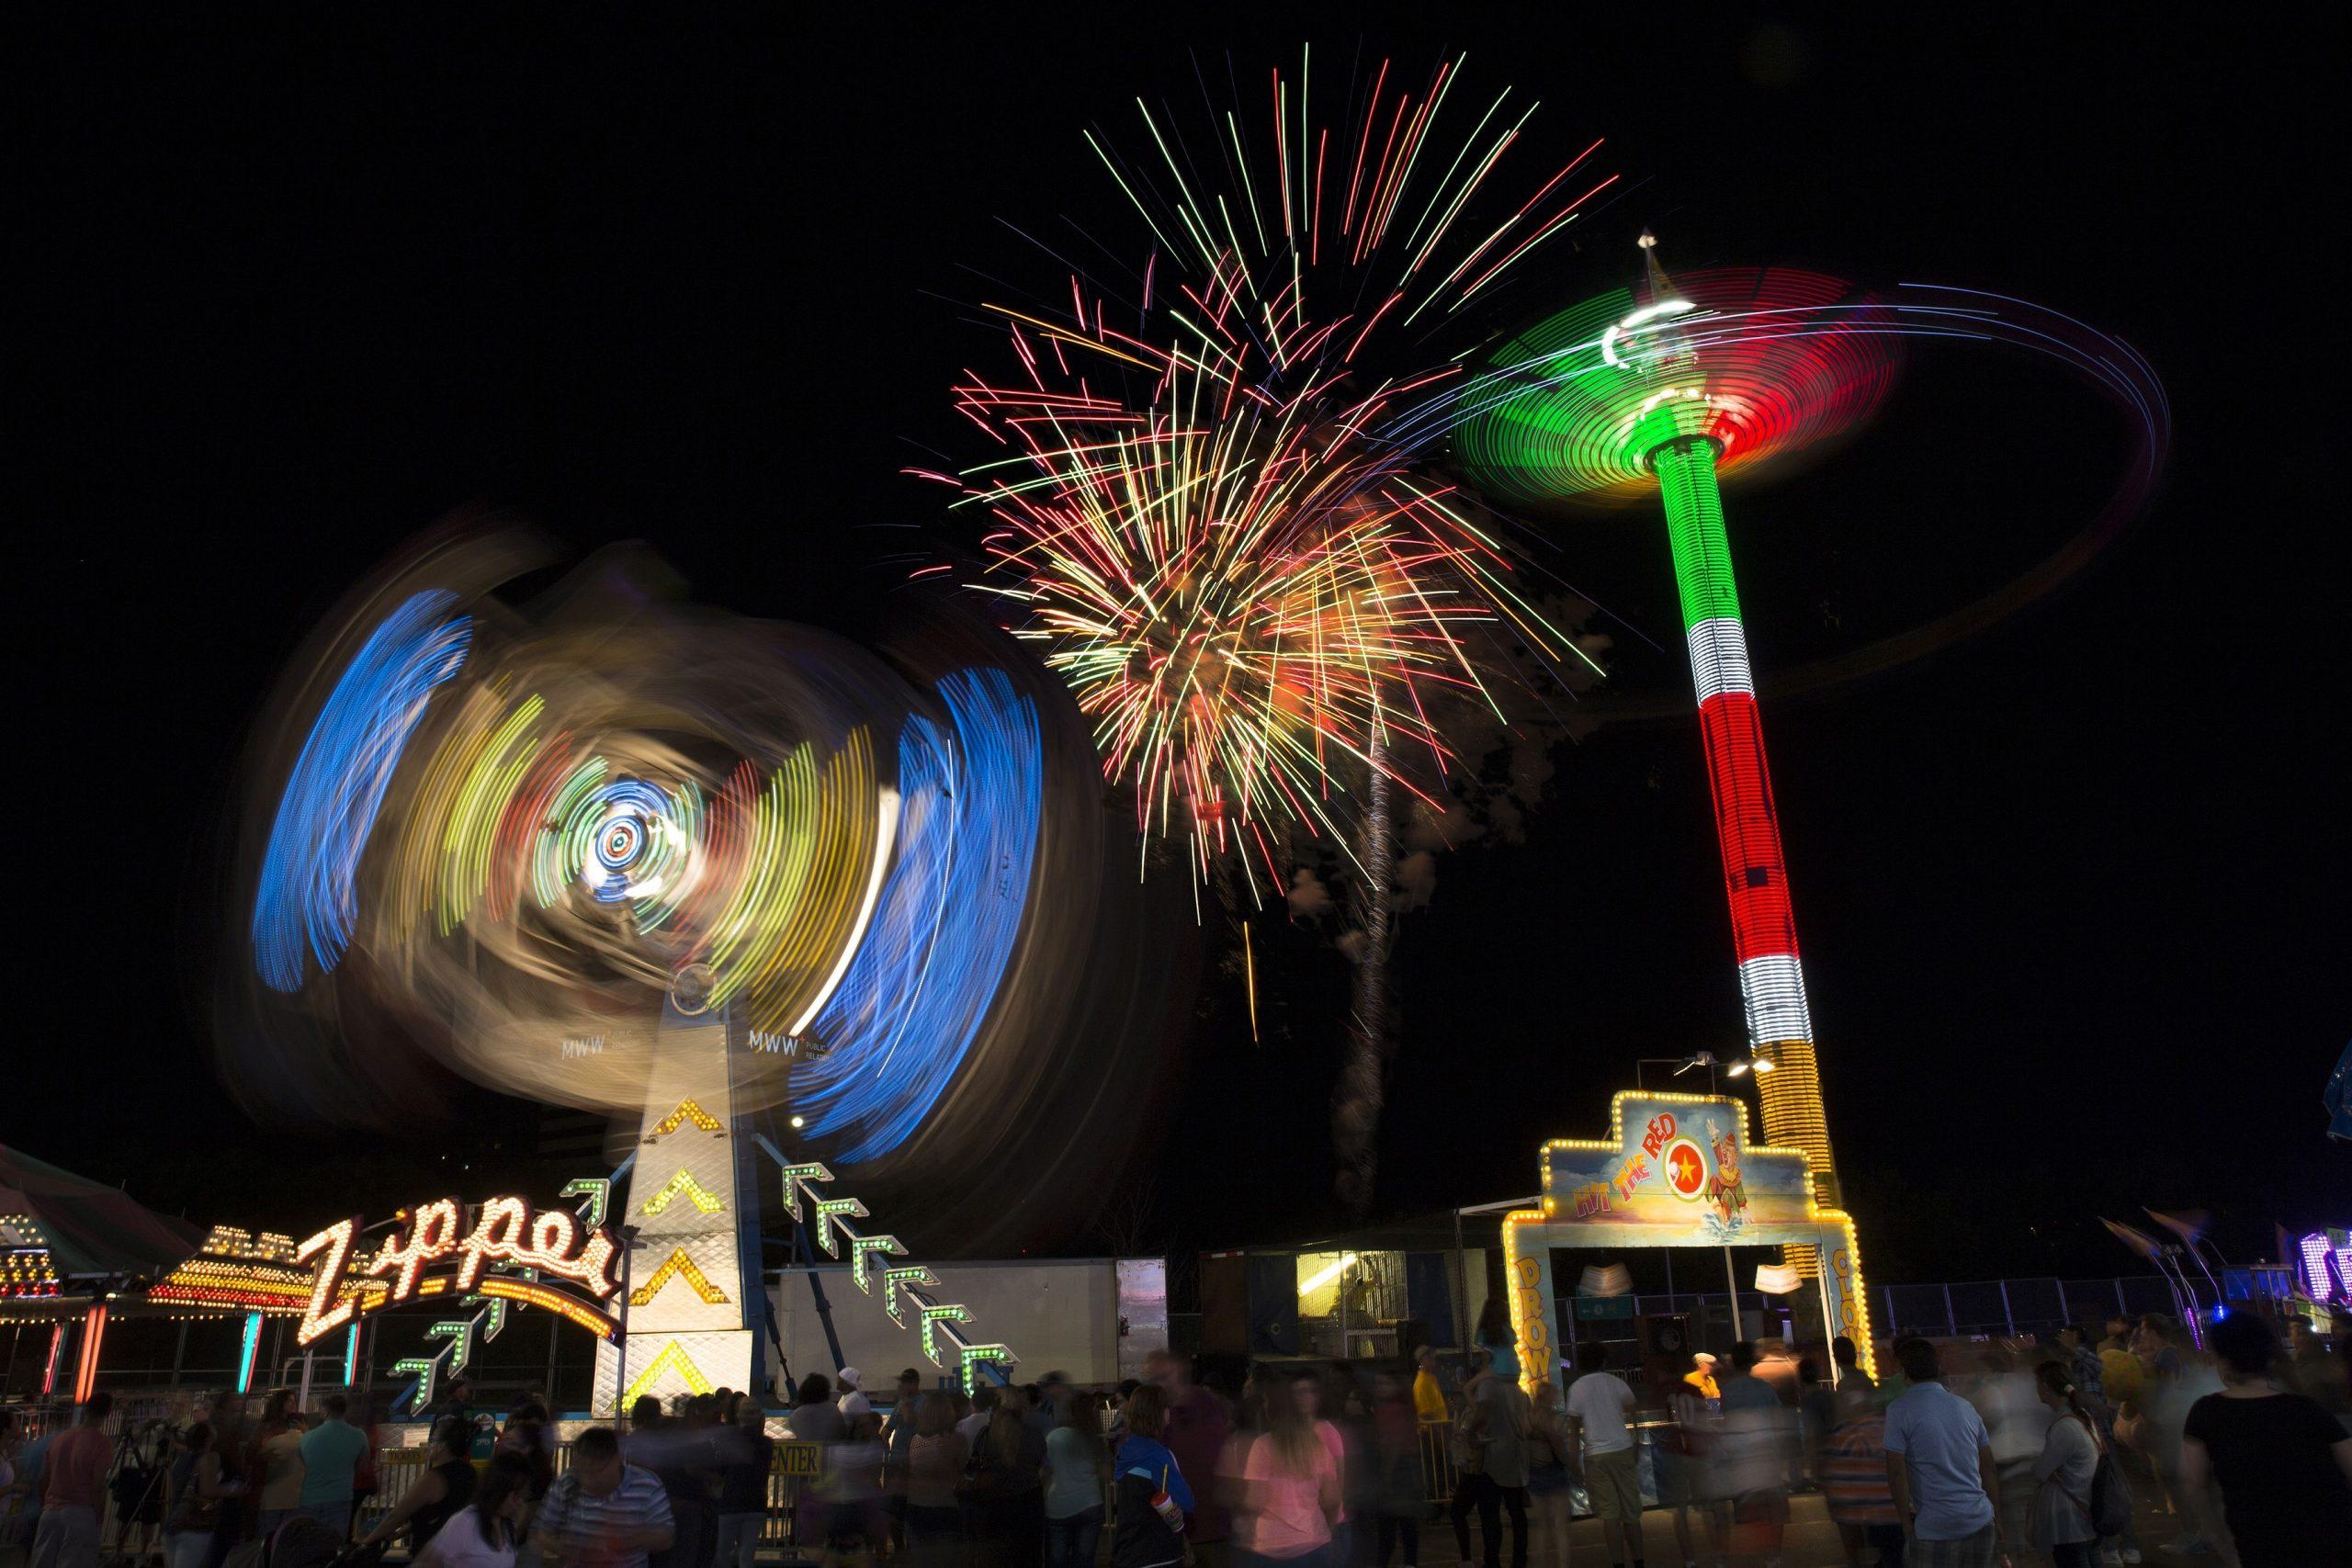 Nj Fairs And Festivals: Canceled, Postponed, Rescheduled